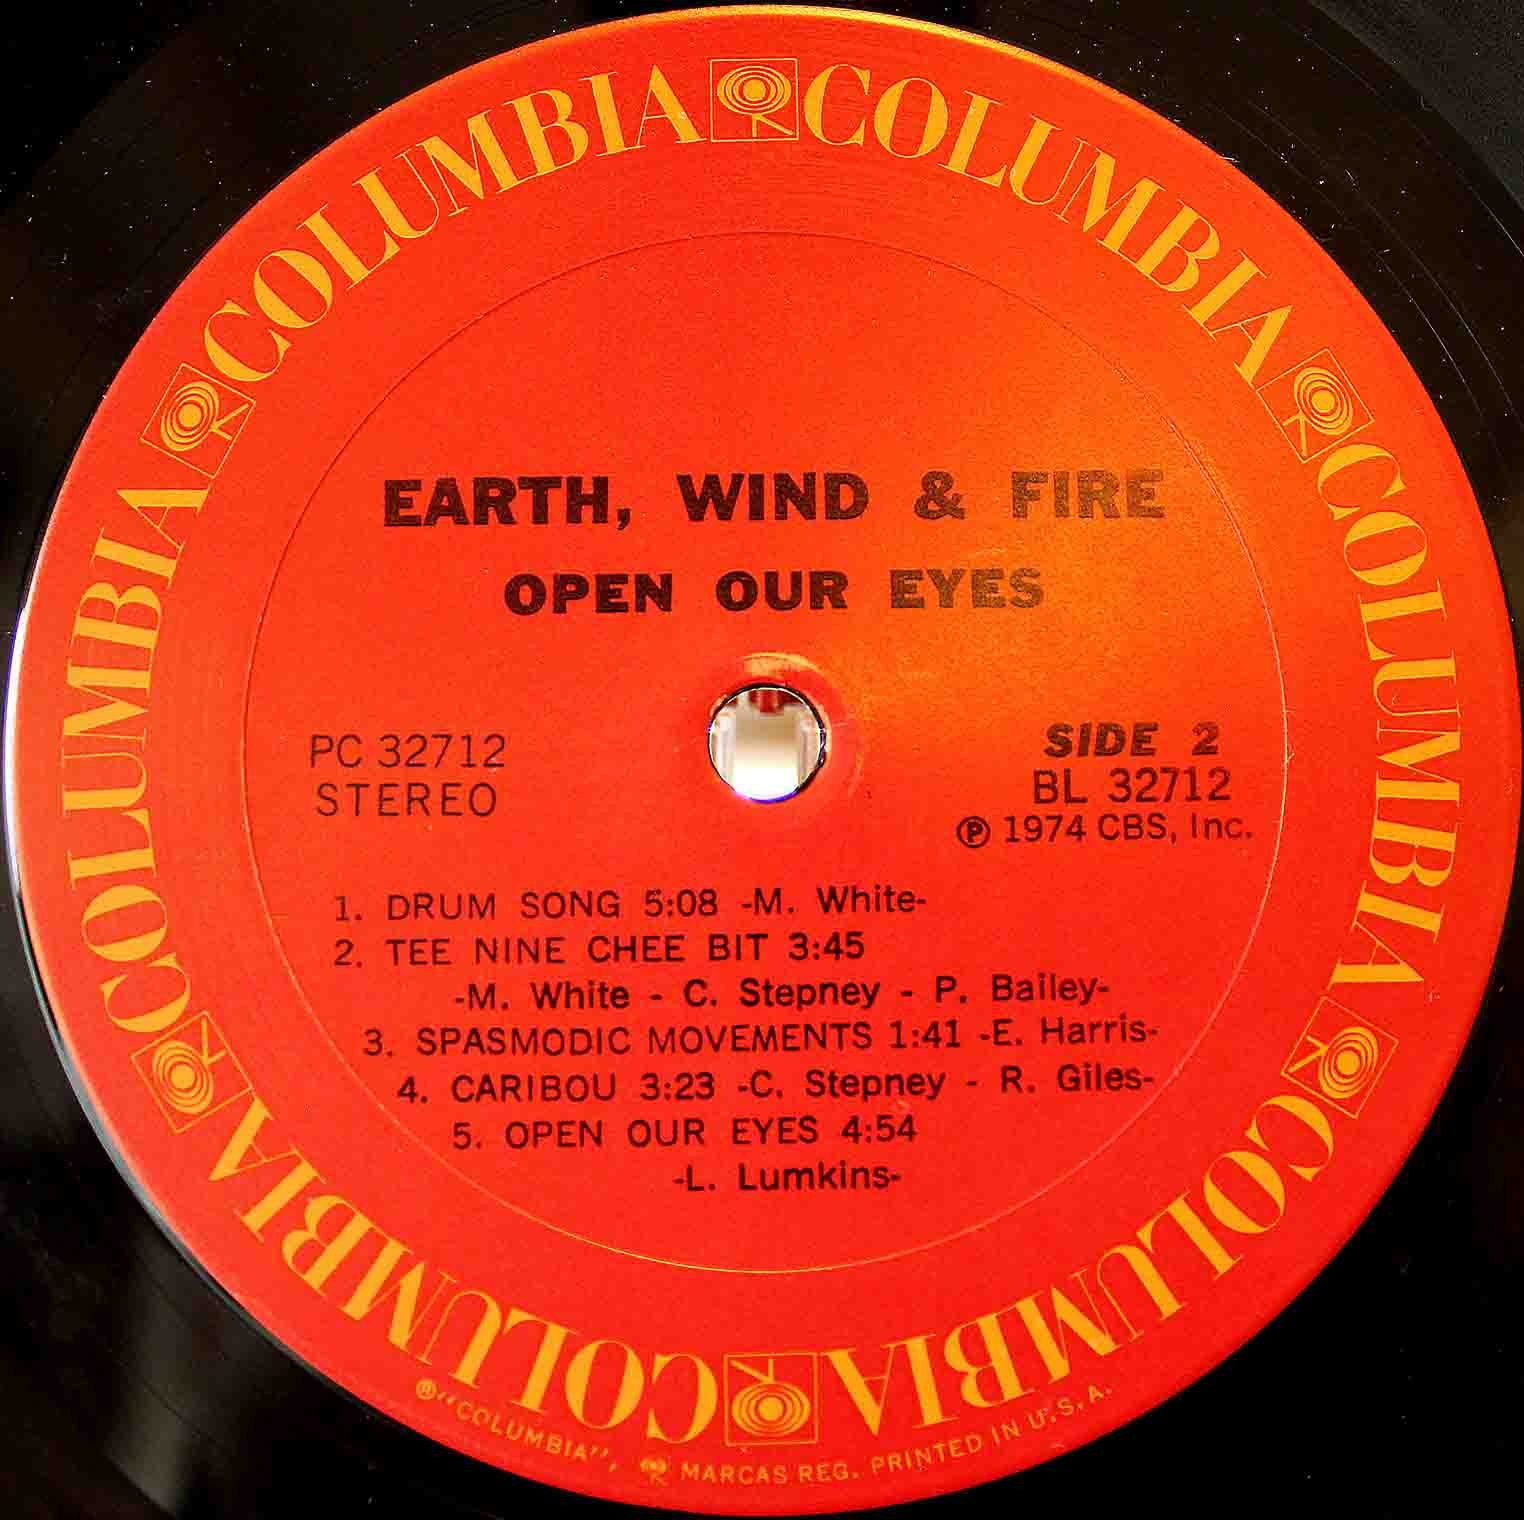 Earth, Wind Fire - Open Our Eyes 04